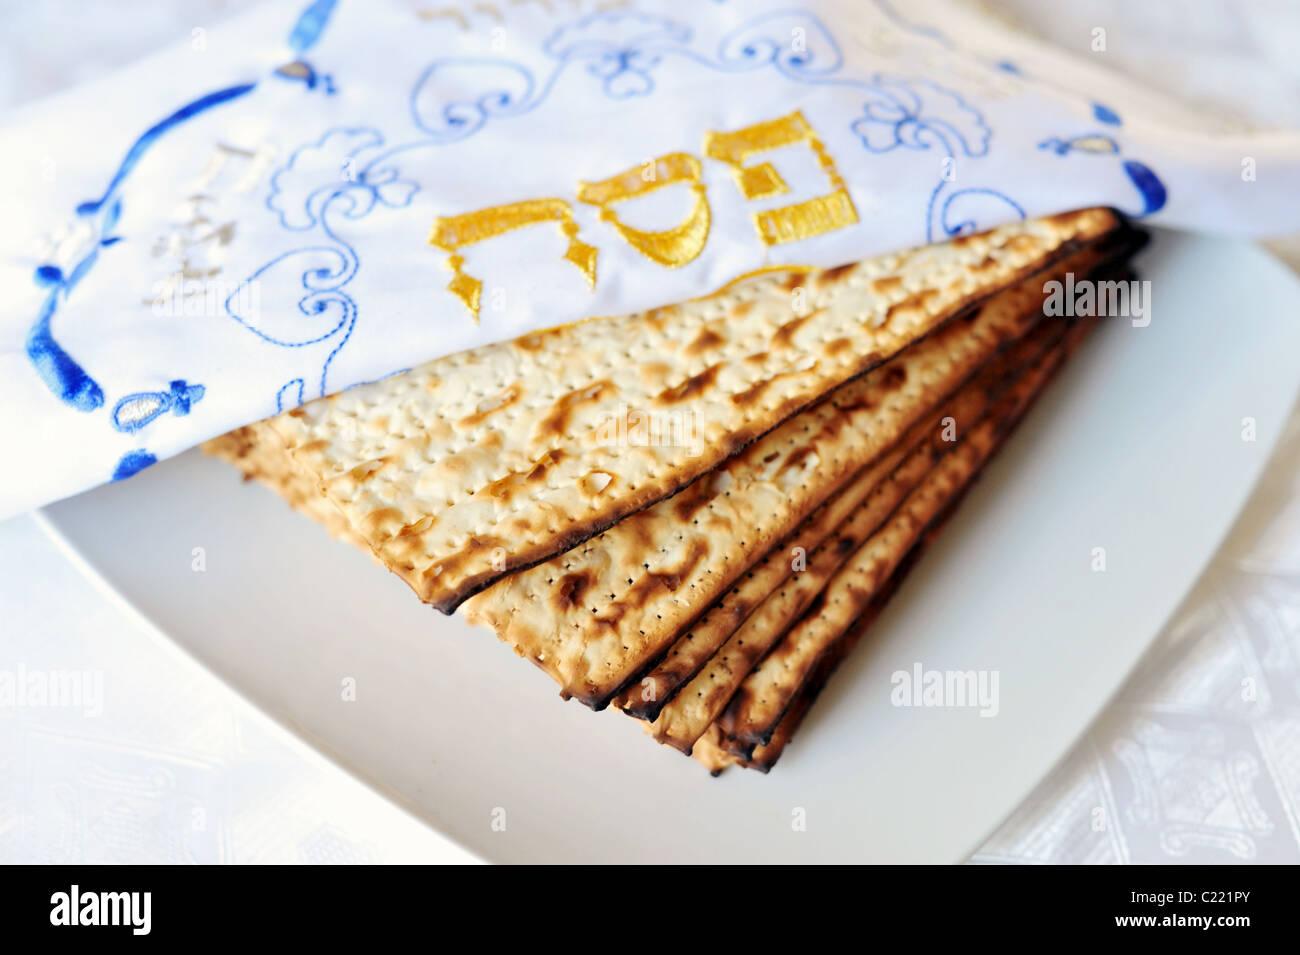 Jewish Holidays - Passover - Pesach - Seder - Stock Image